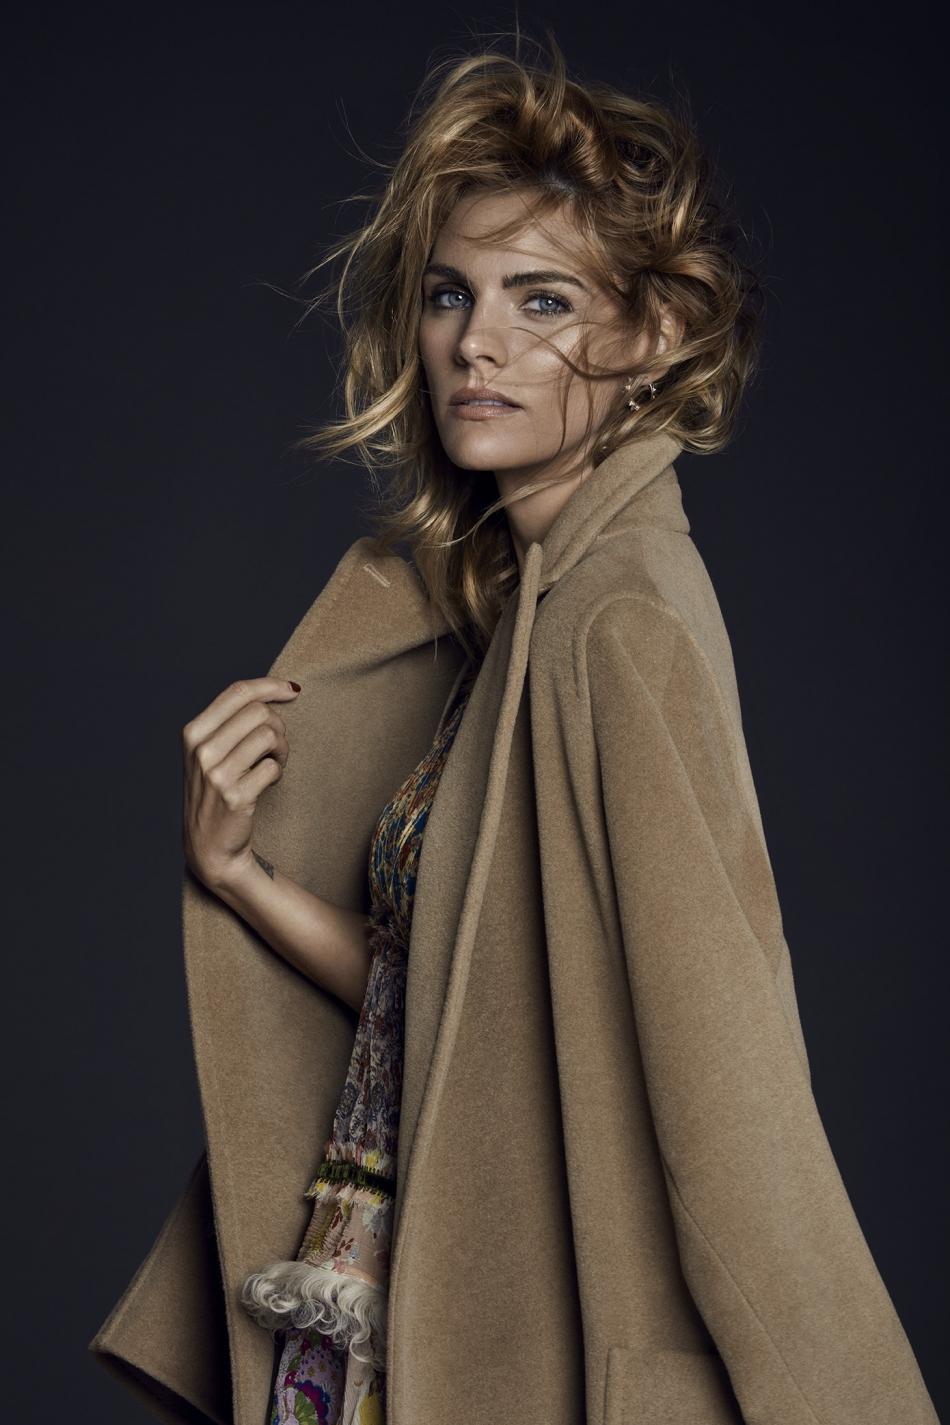 Valero Rioja Photography cover Amaia Salamanca Fashion Magazine 1